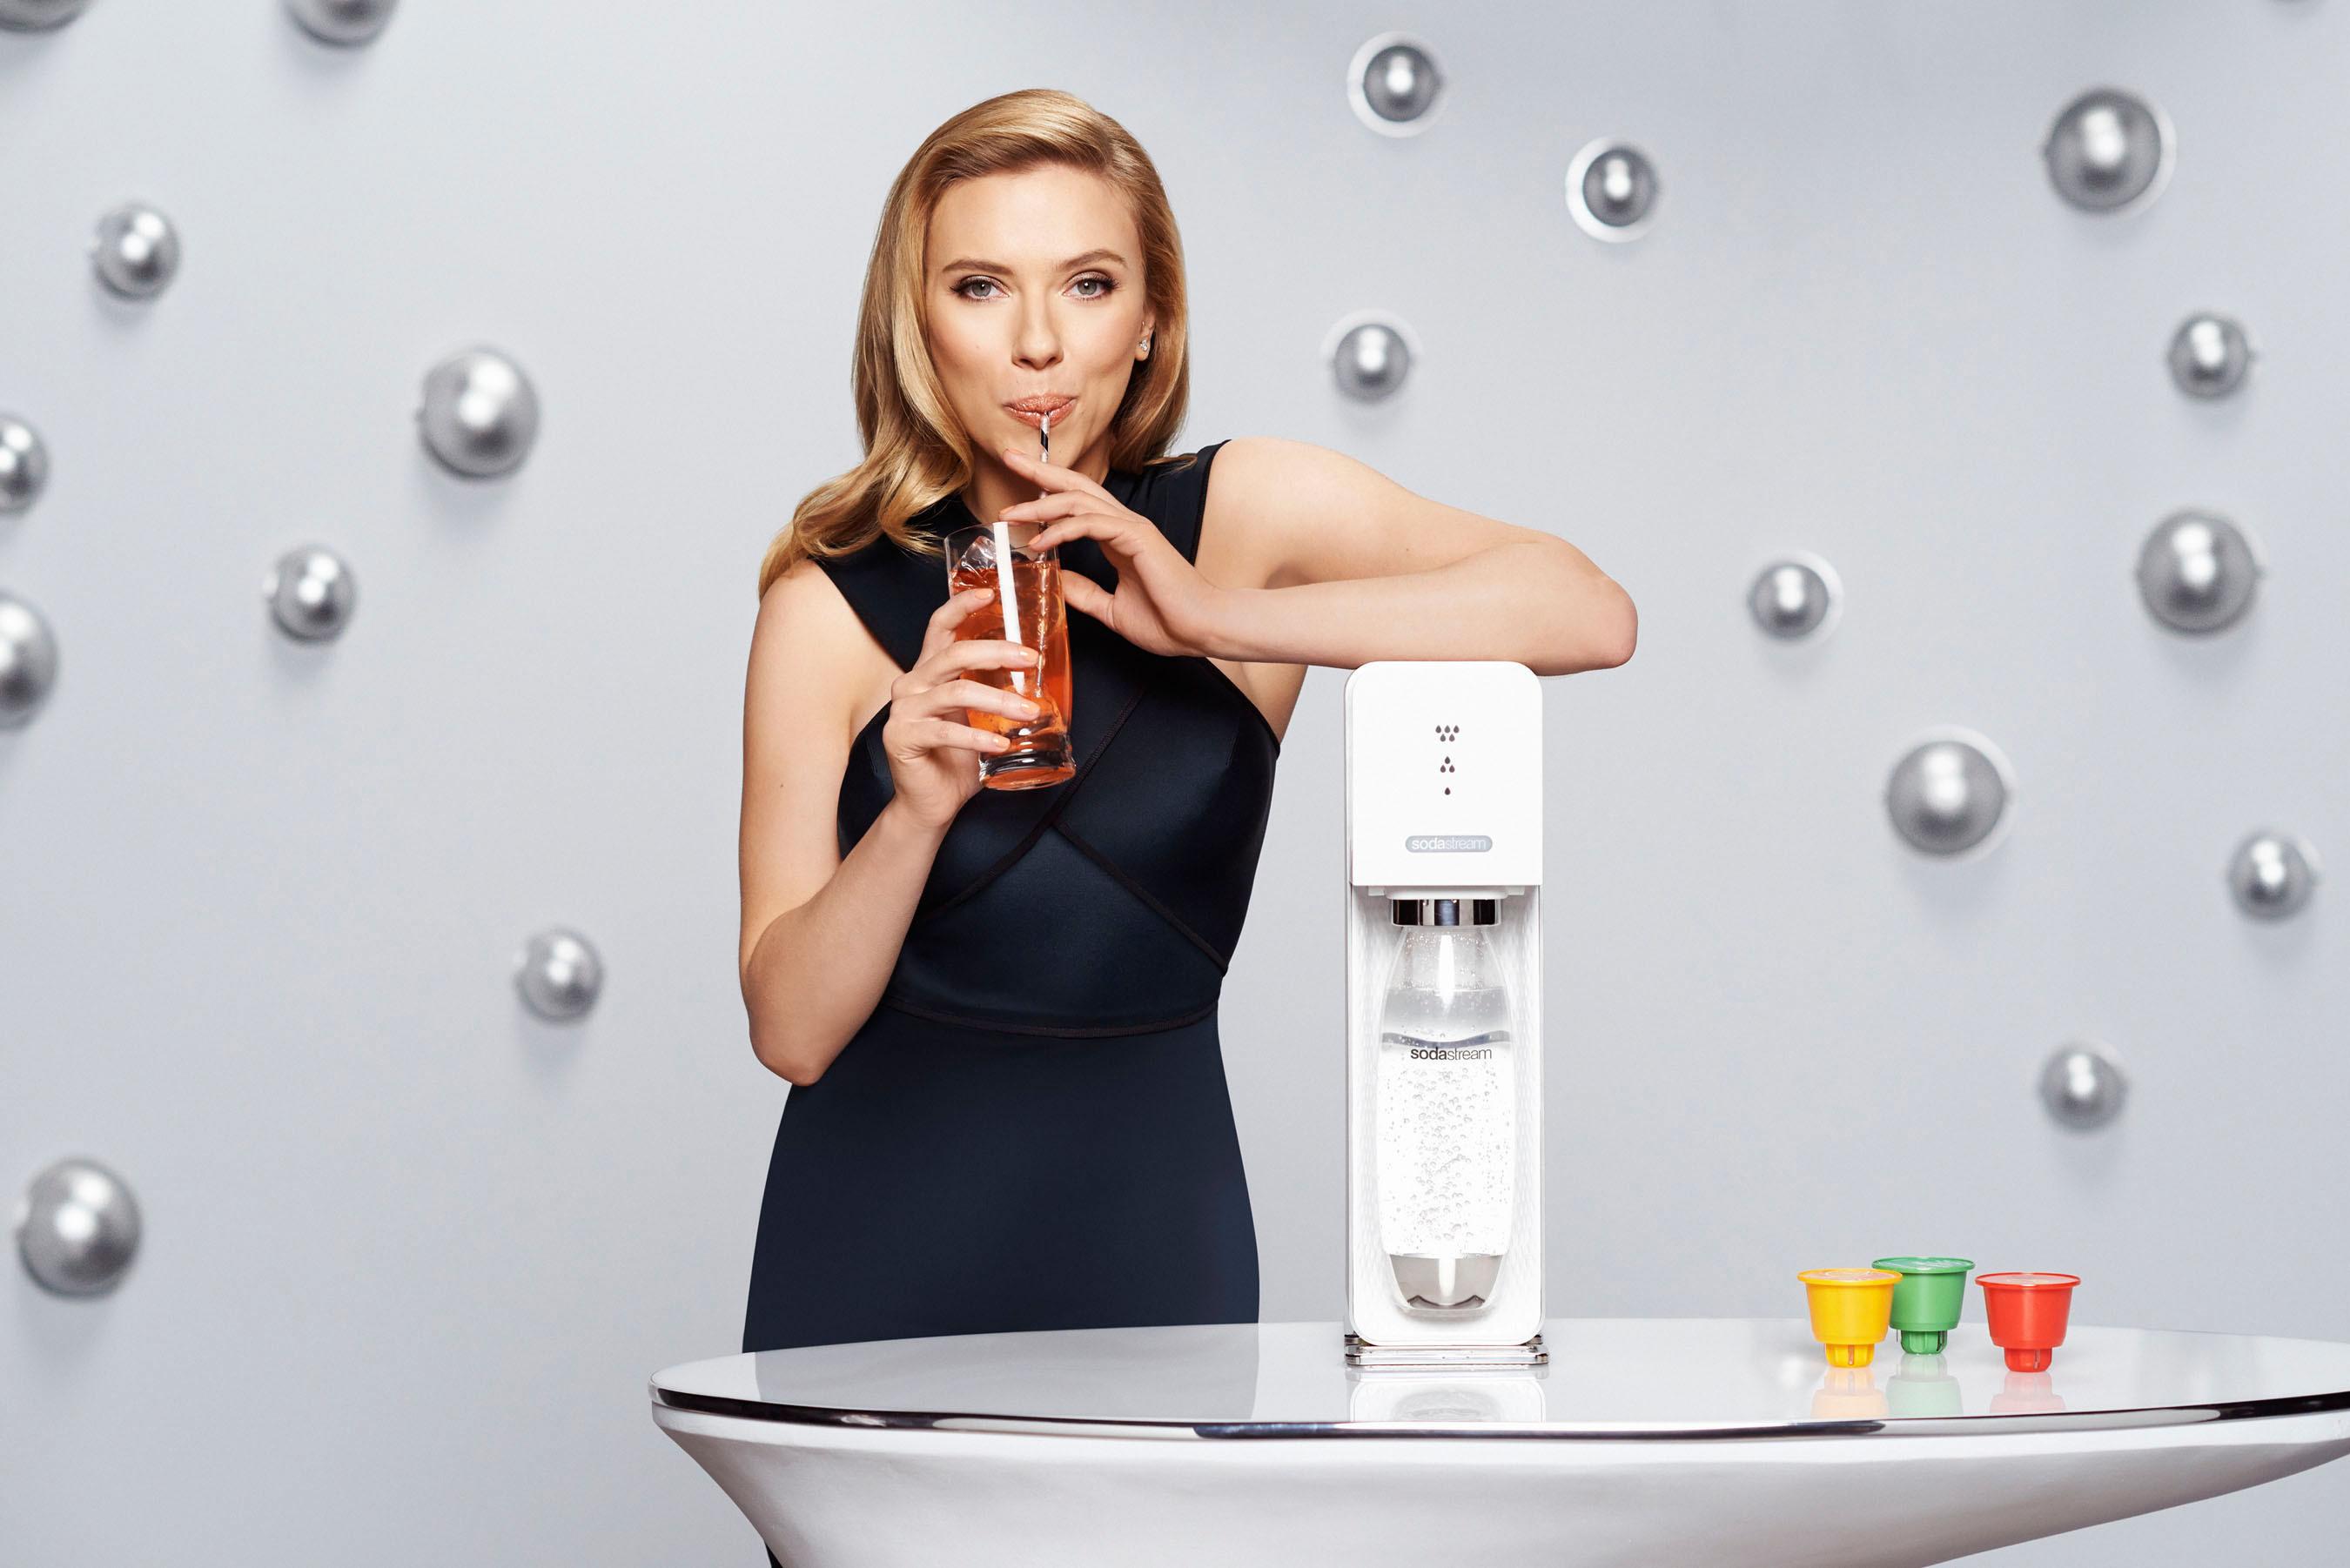 SodaStream unveils Scarlett Johansson as its first-ever Global Brand Ambassador. (PRNewsFoto/SodaStream International Ltd.) (PRNewsFoto/SODASTREAM INTERNATIONAL LTD.)